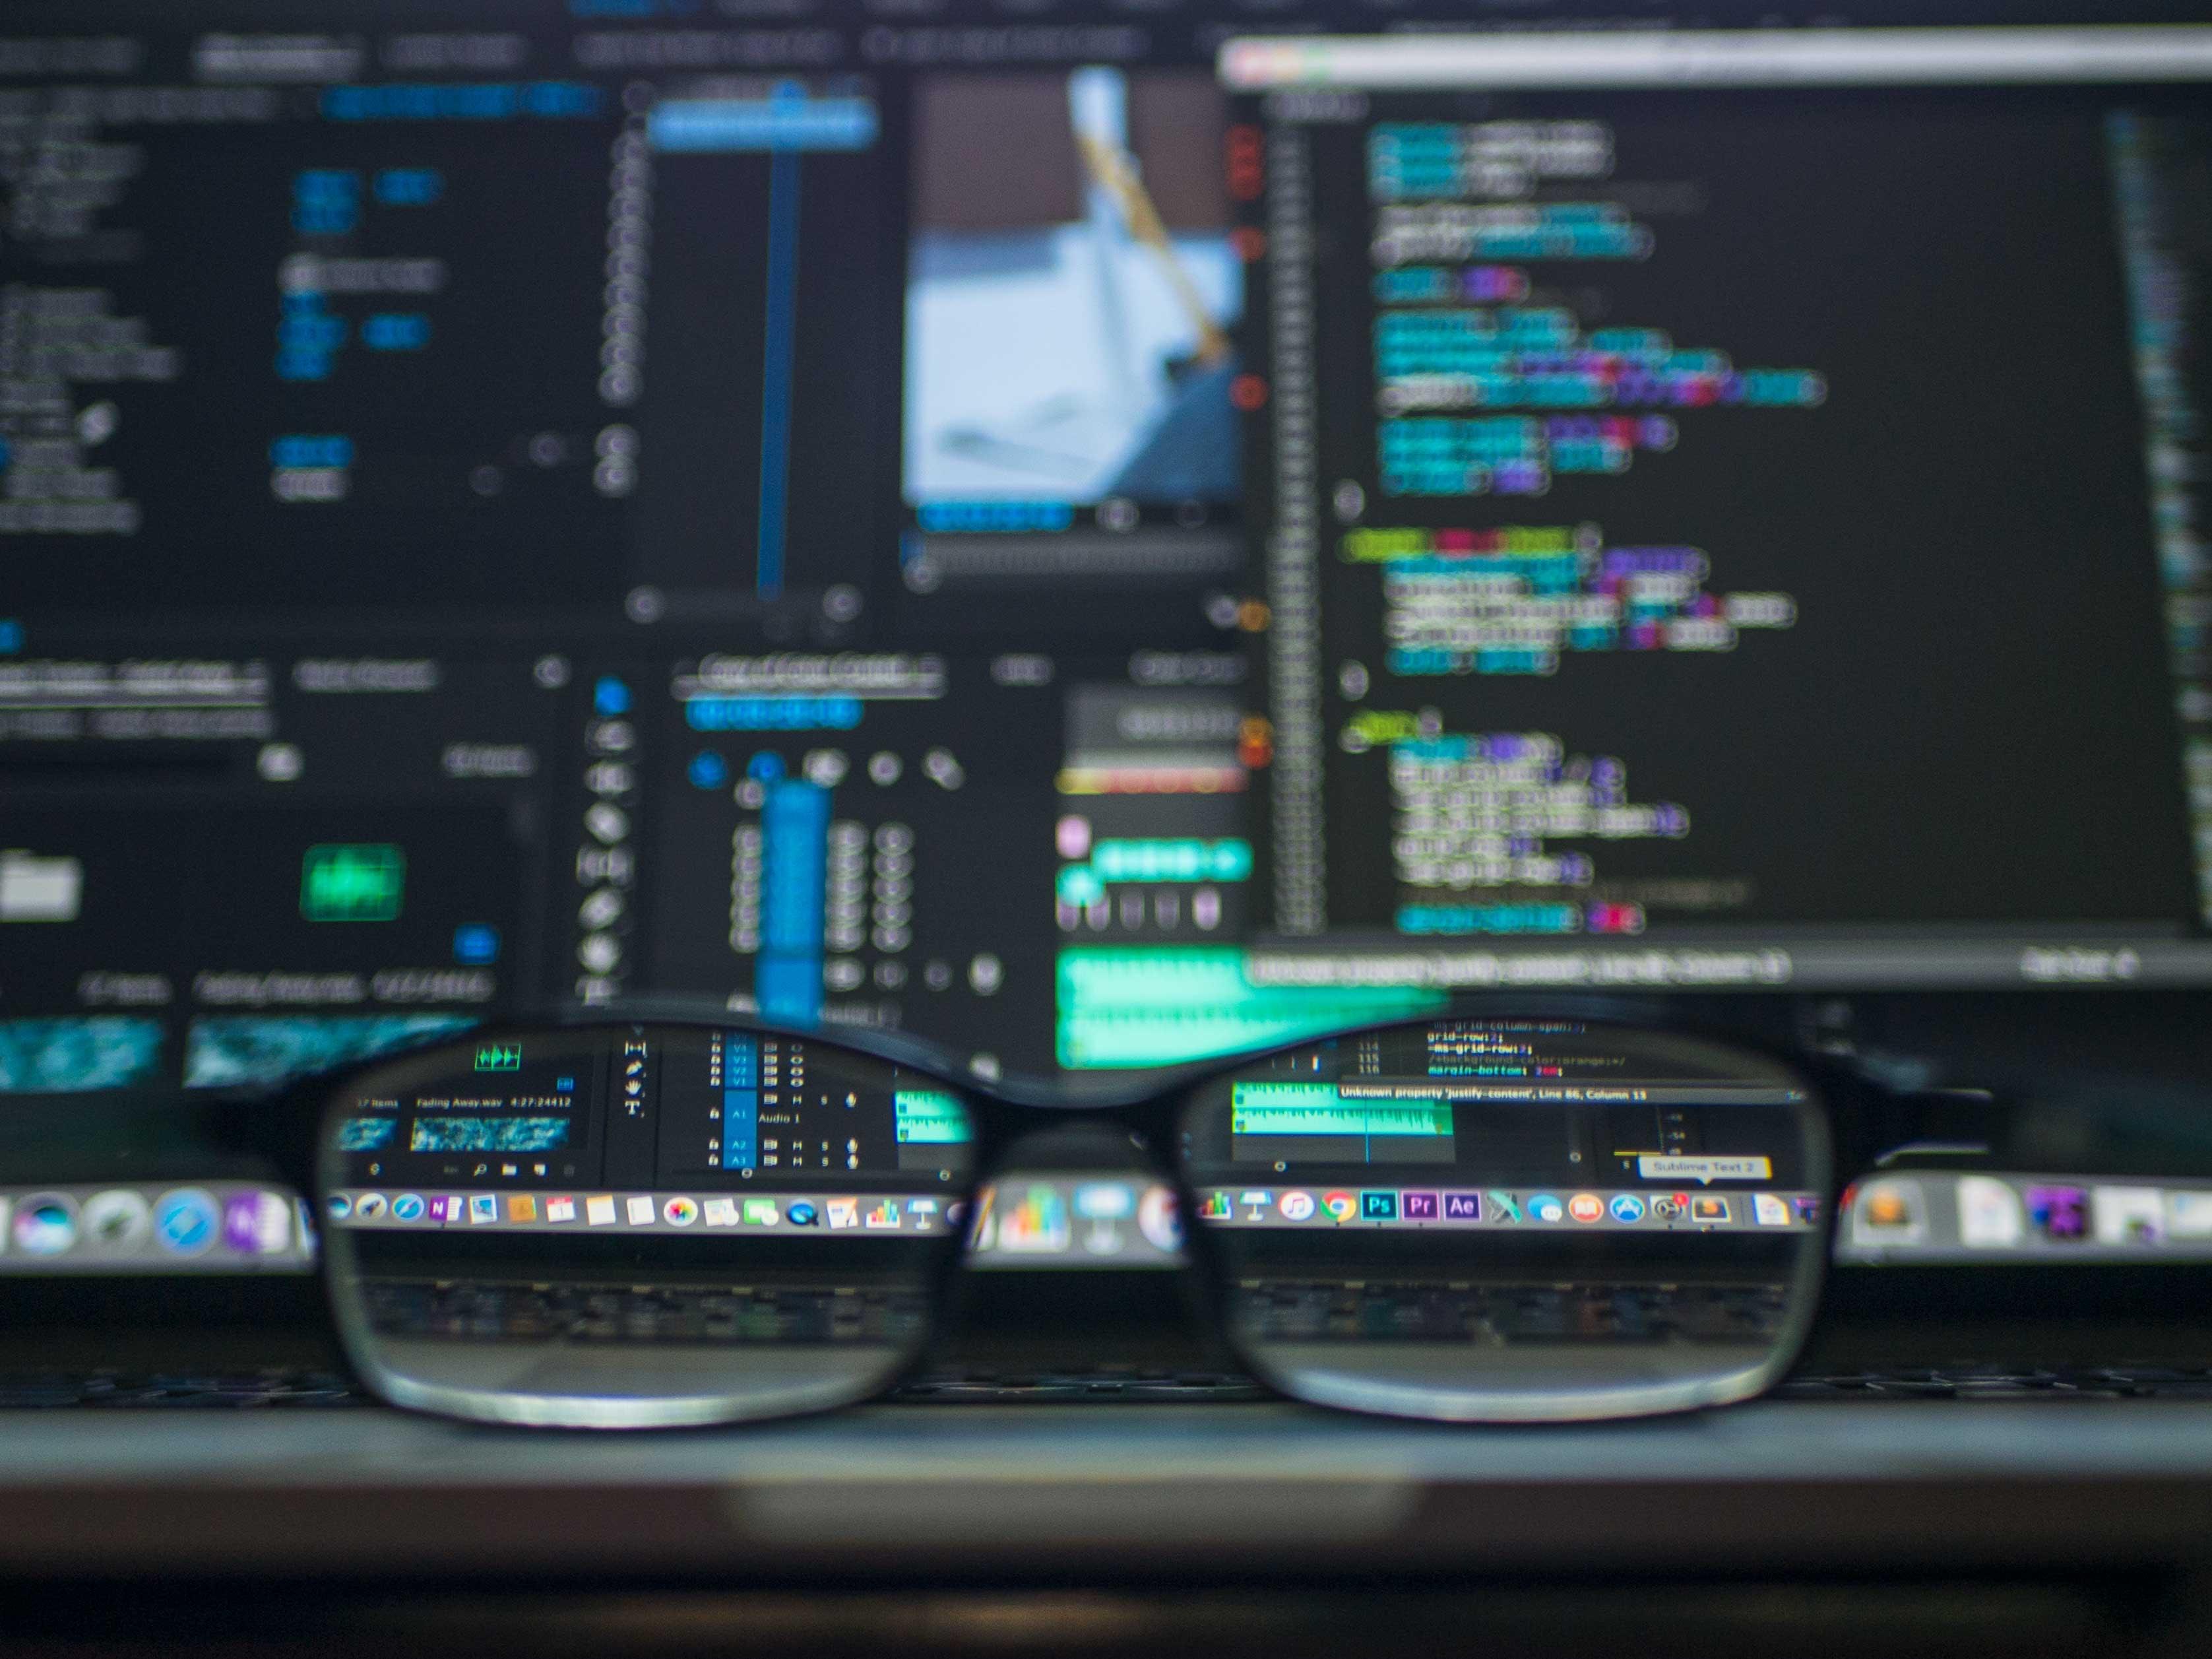 【Webのことが分からない人向け】Webサイトの制作に欠かせないコーディング・プログラミング言語